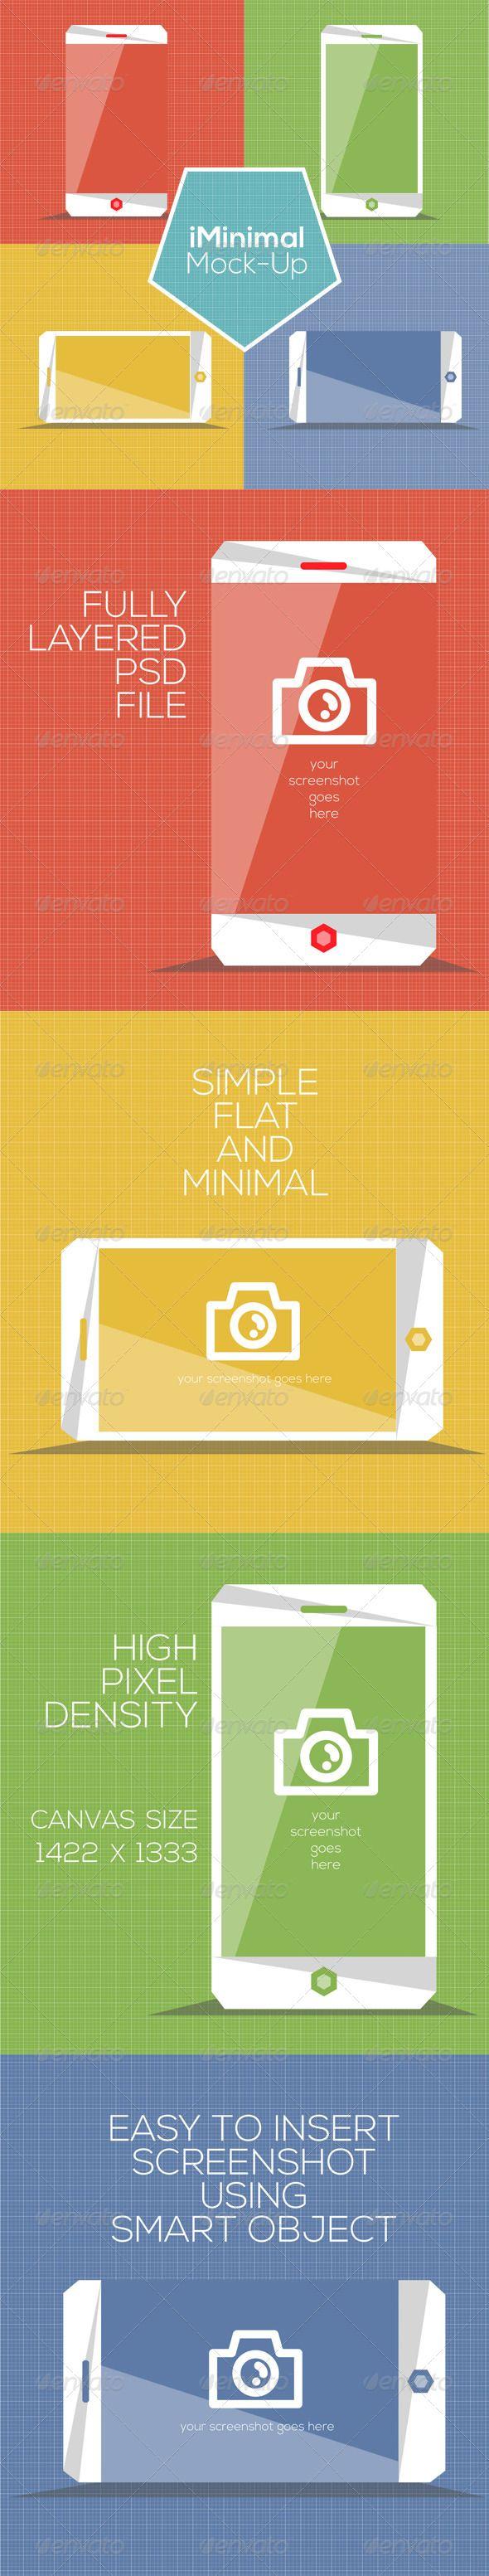 iMinimal iPhone Mock Up